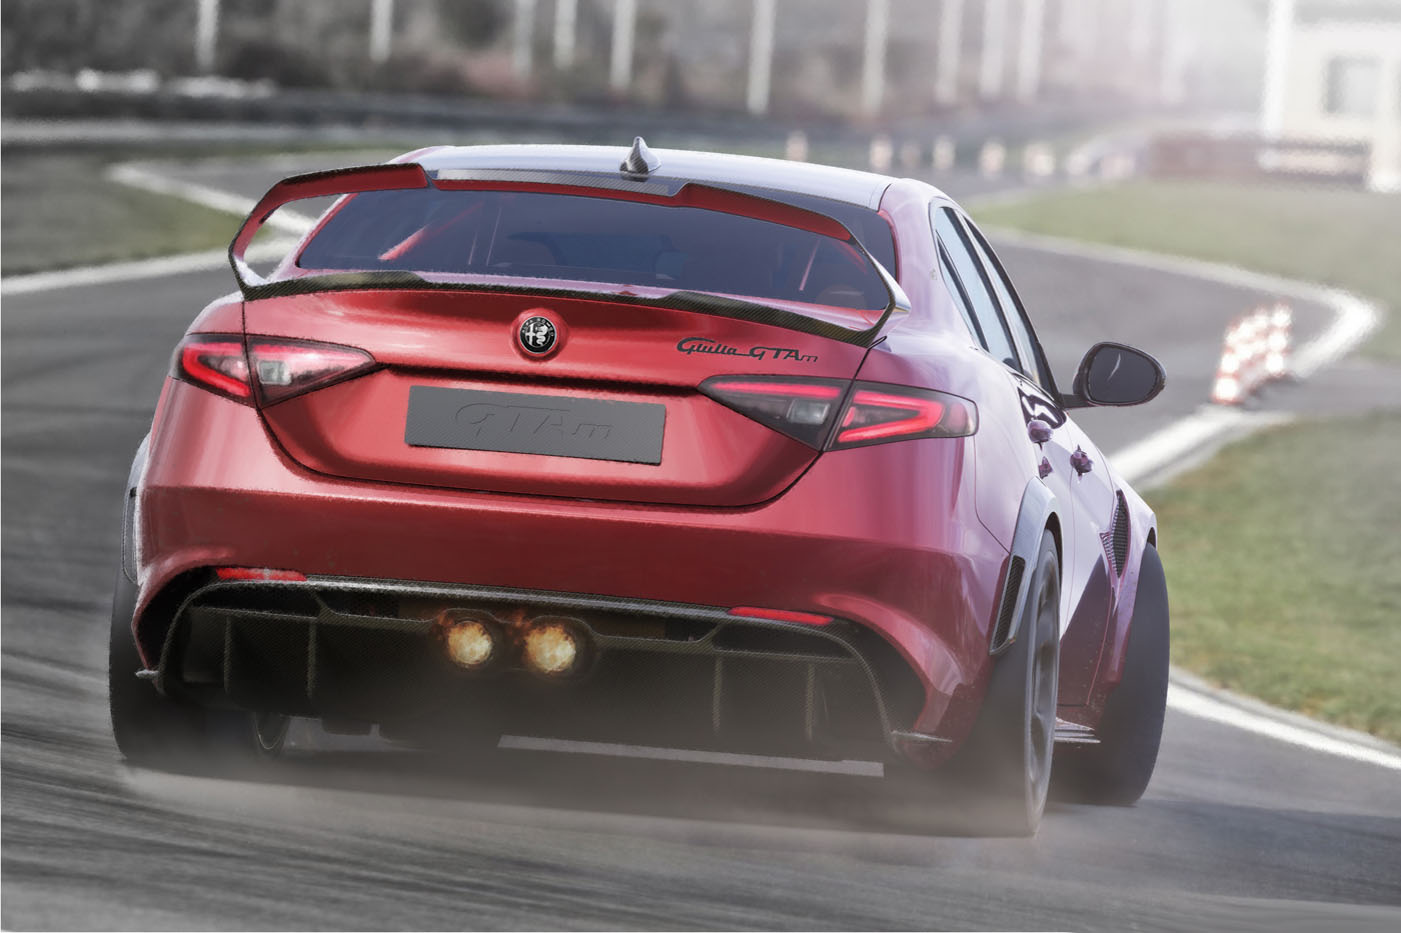 Alfy Romego Giulia GTA - premiera